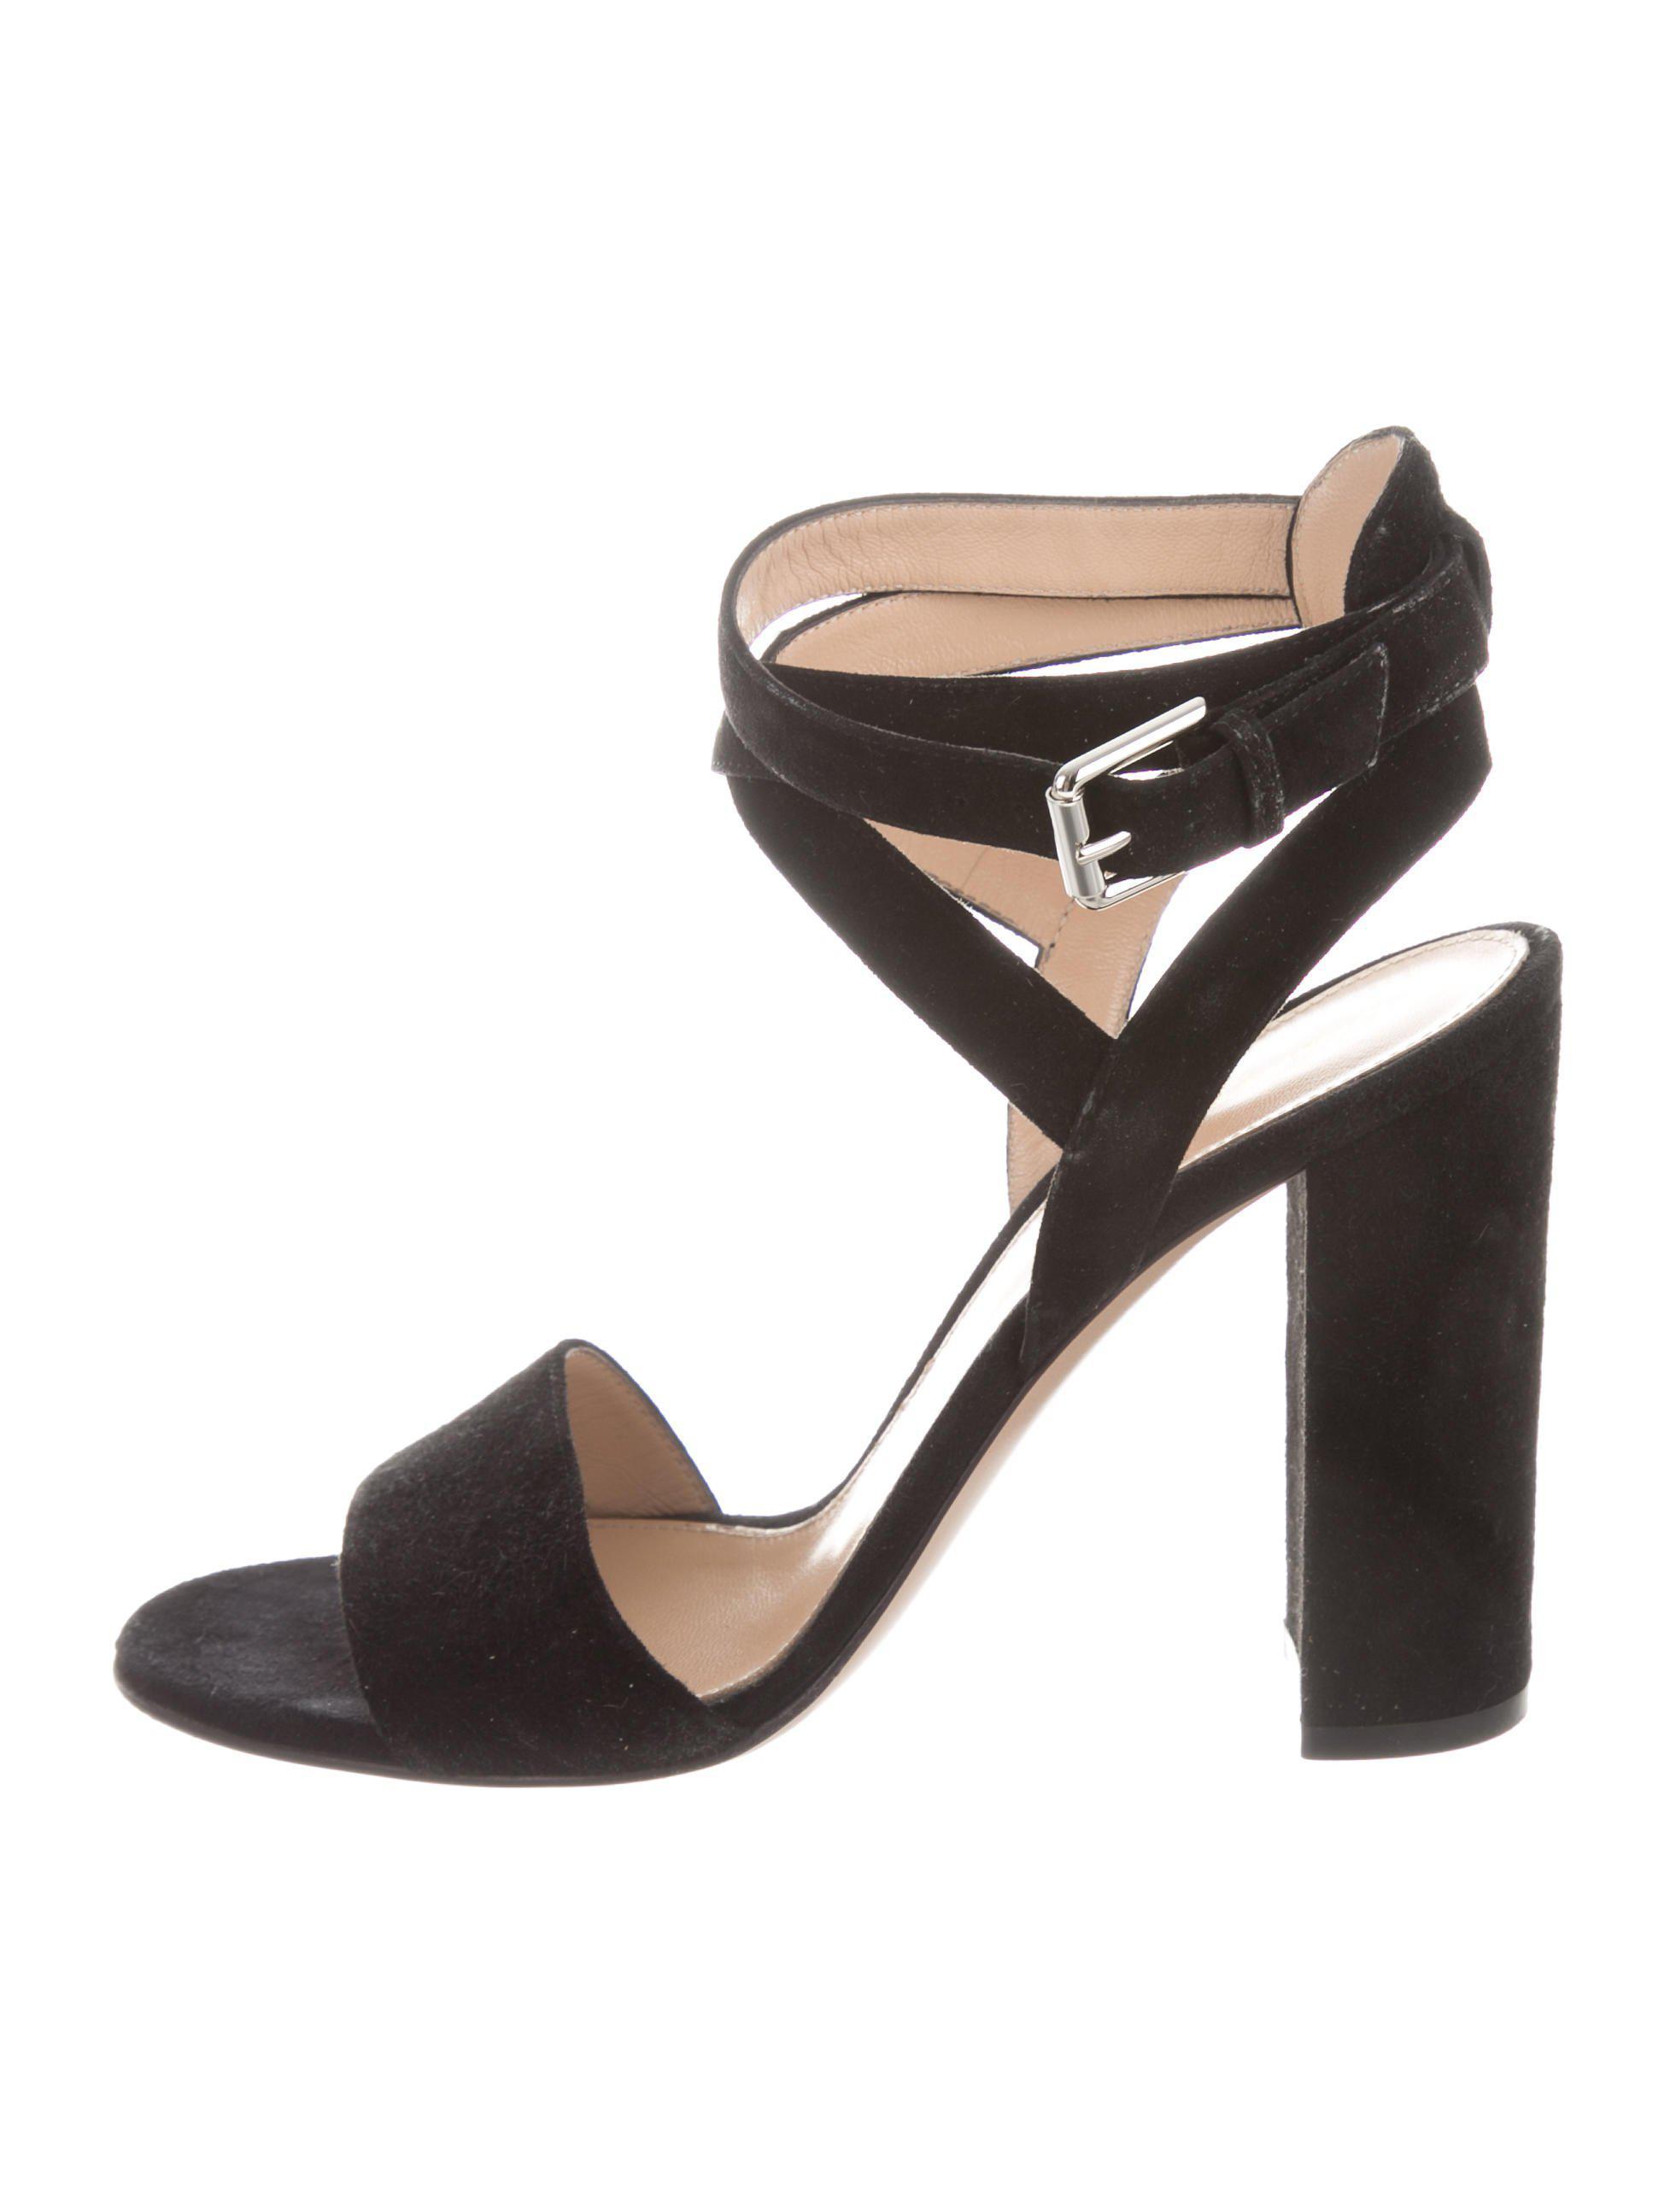 Gianvito Rossi Suede Multistrap Sandals outlet sale ARA2m6Sx